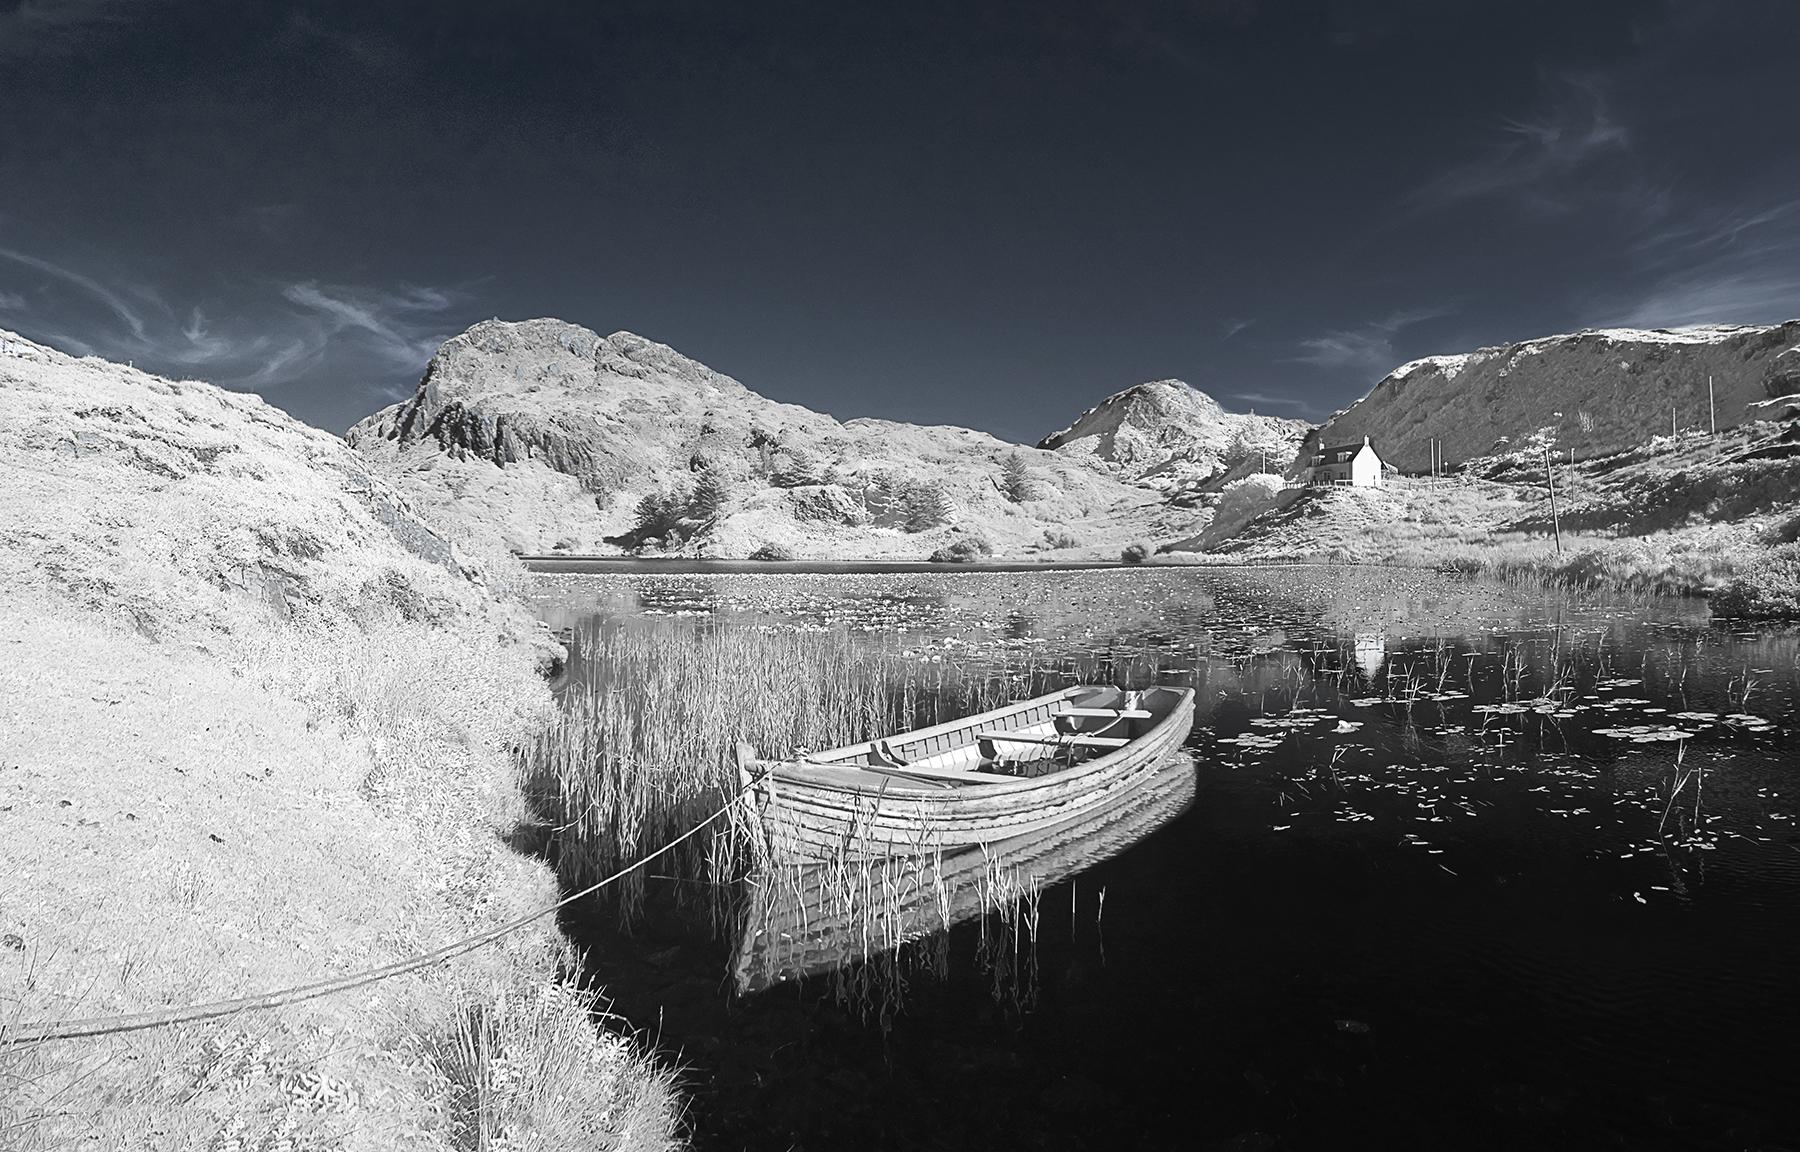 Boat at Tarbet 3573 - 3575